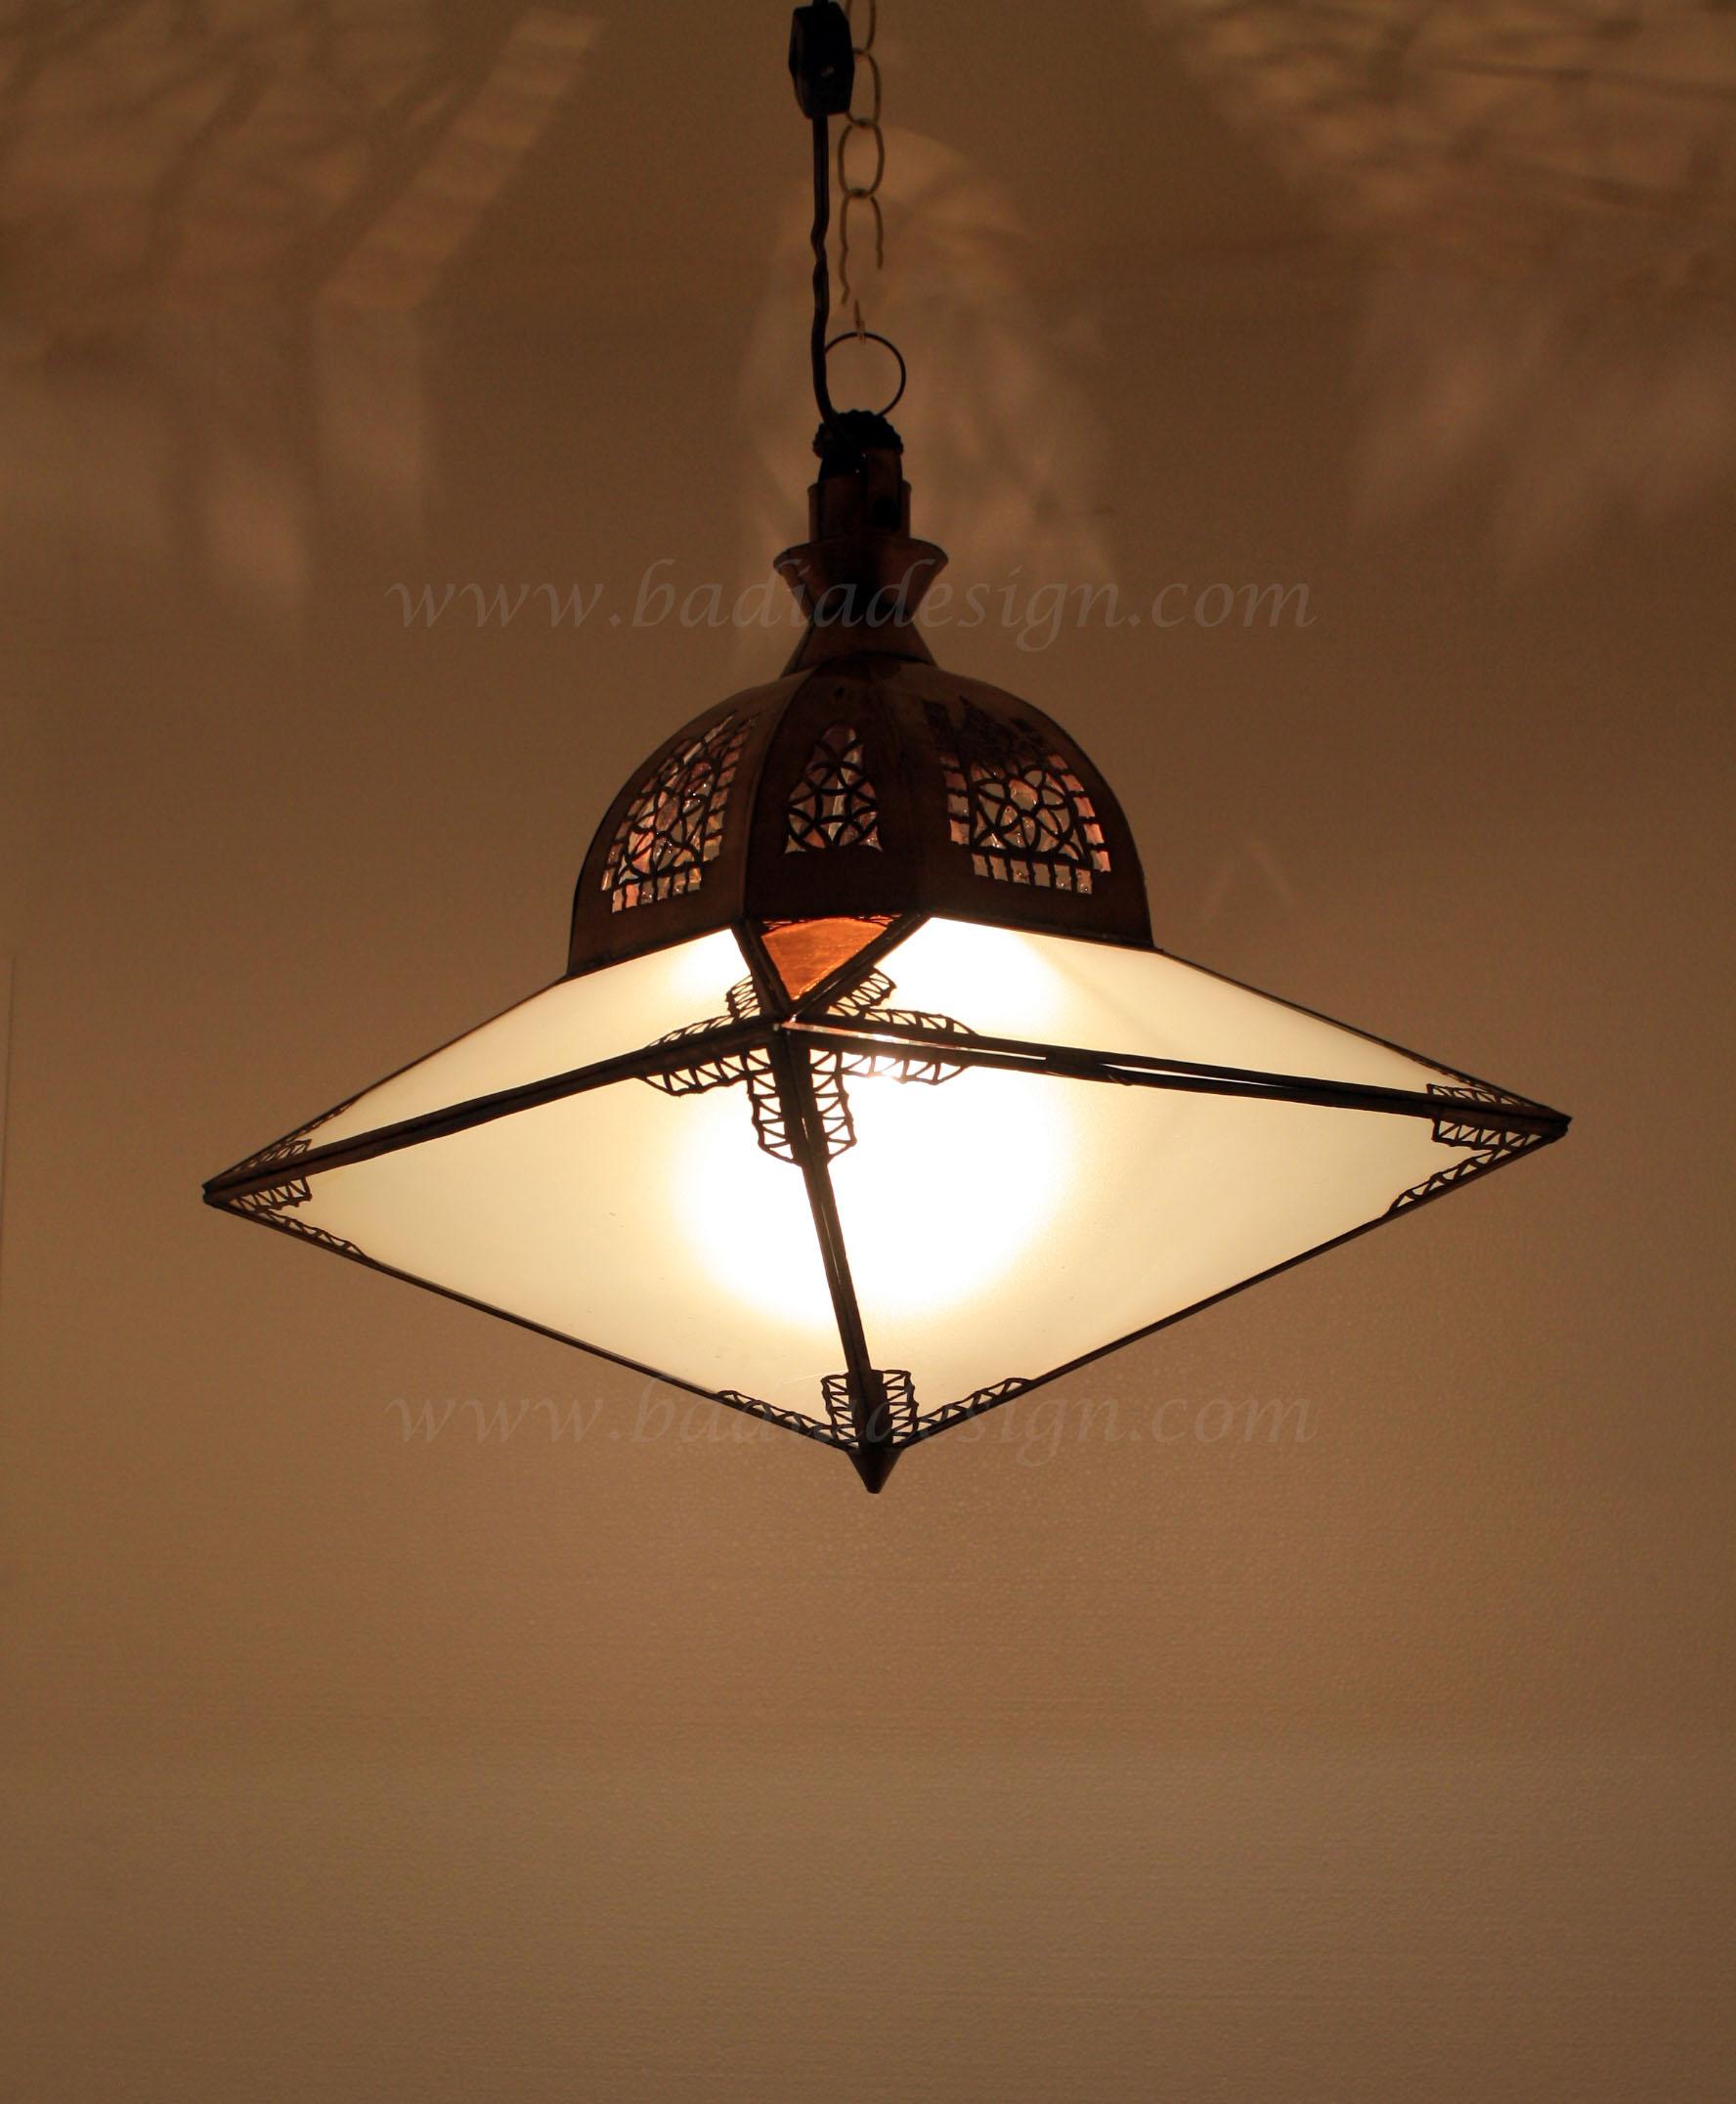 moroccan-lighting-oakland.jpg